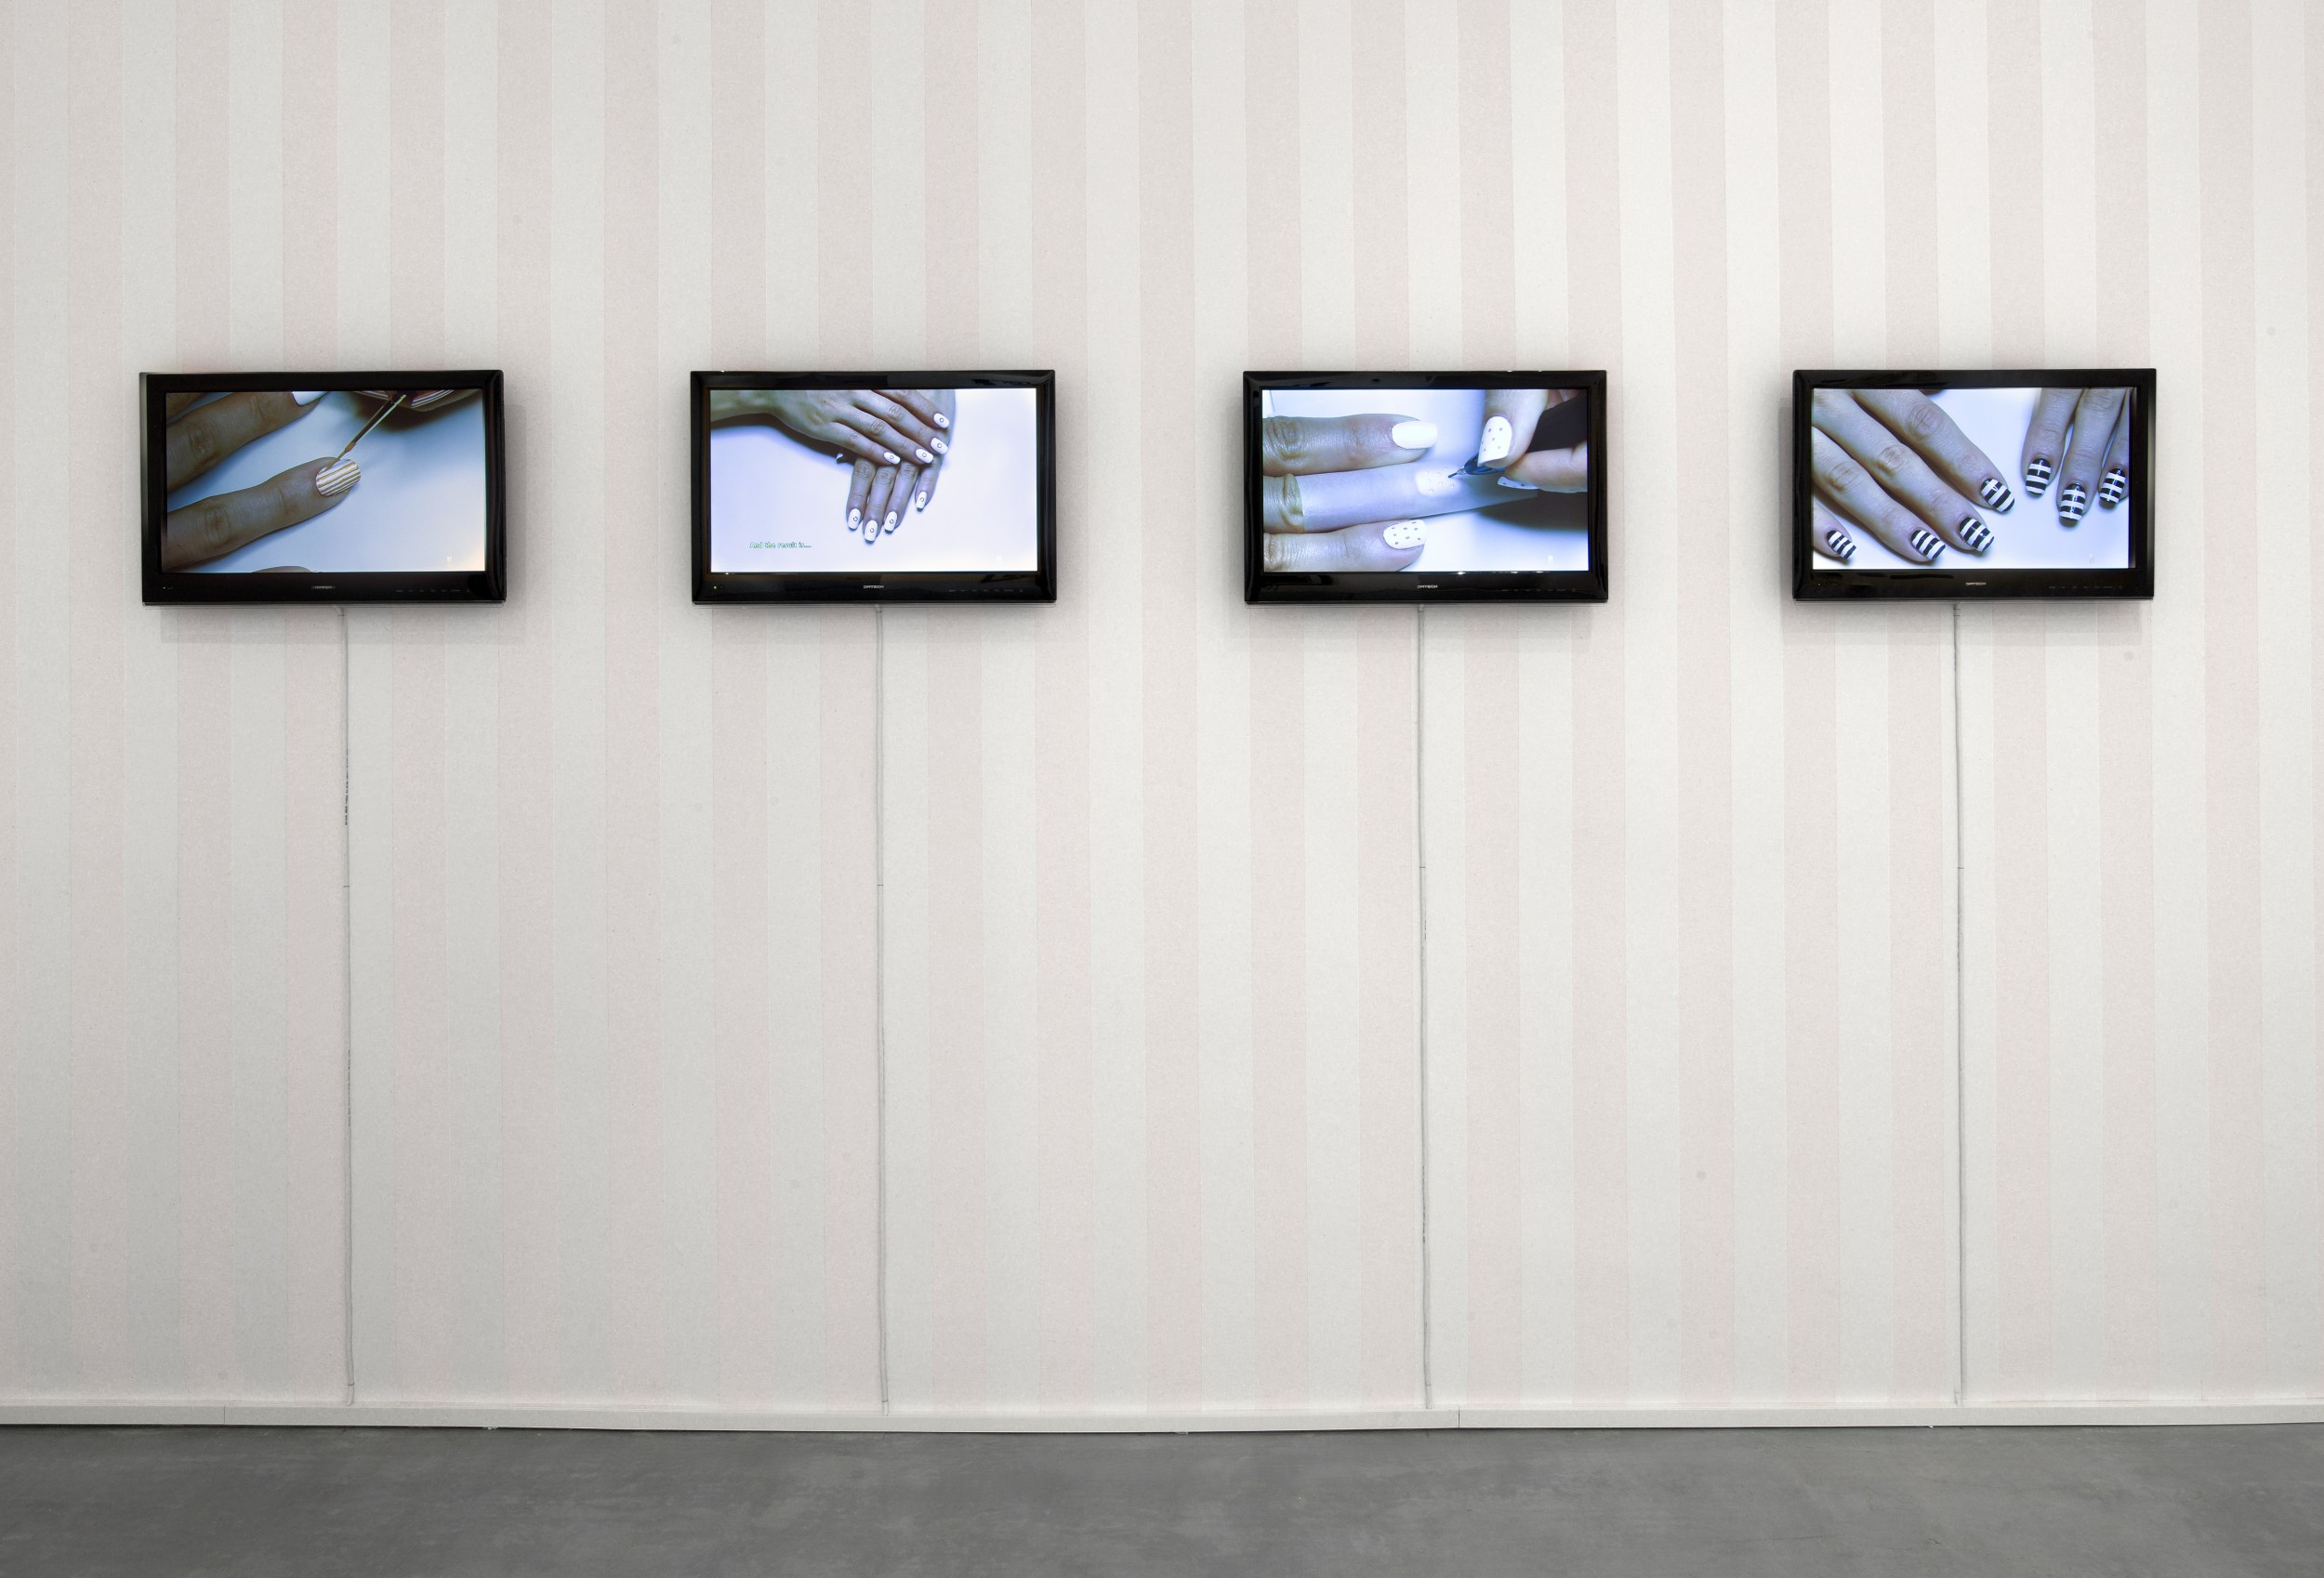 D Exhibition Design Tutorial : Nailpolish tutorials limac